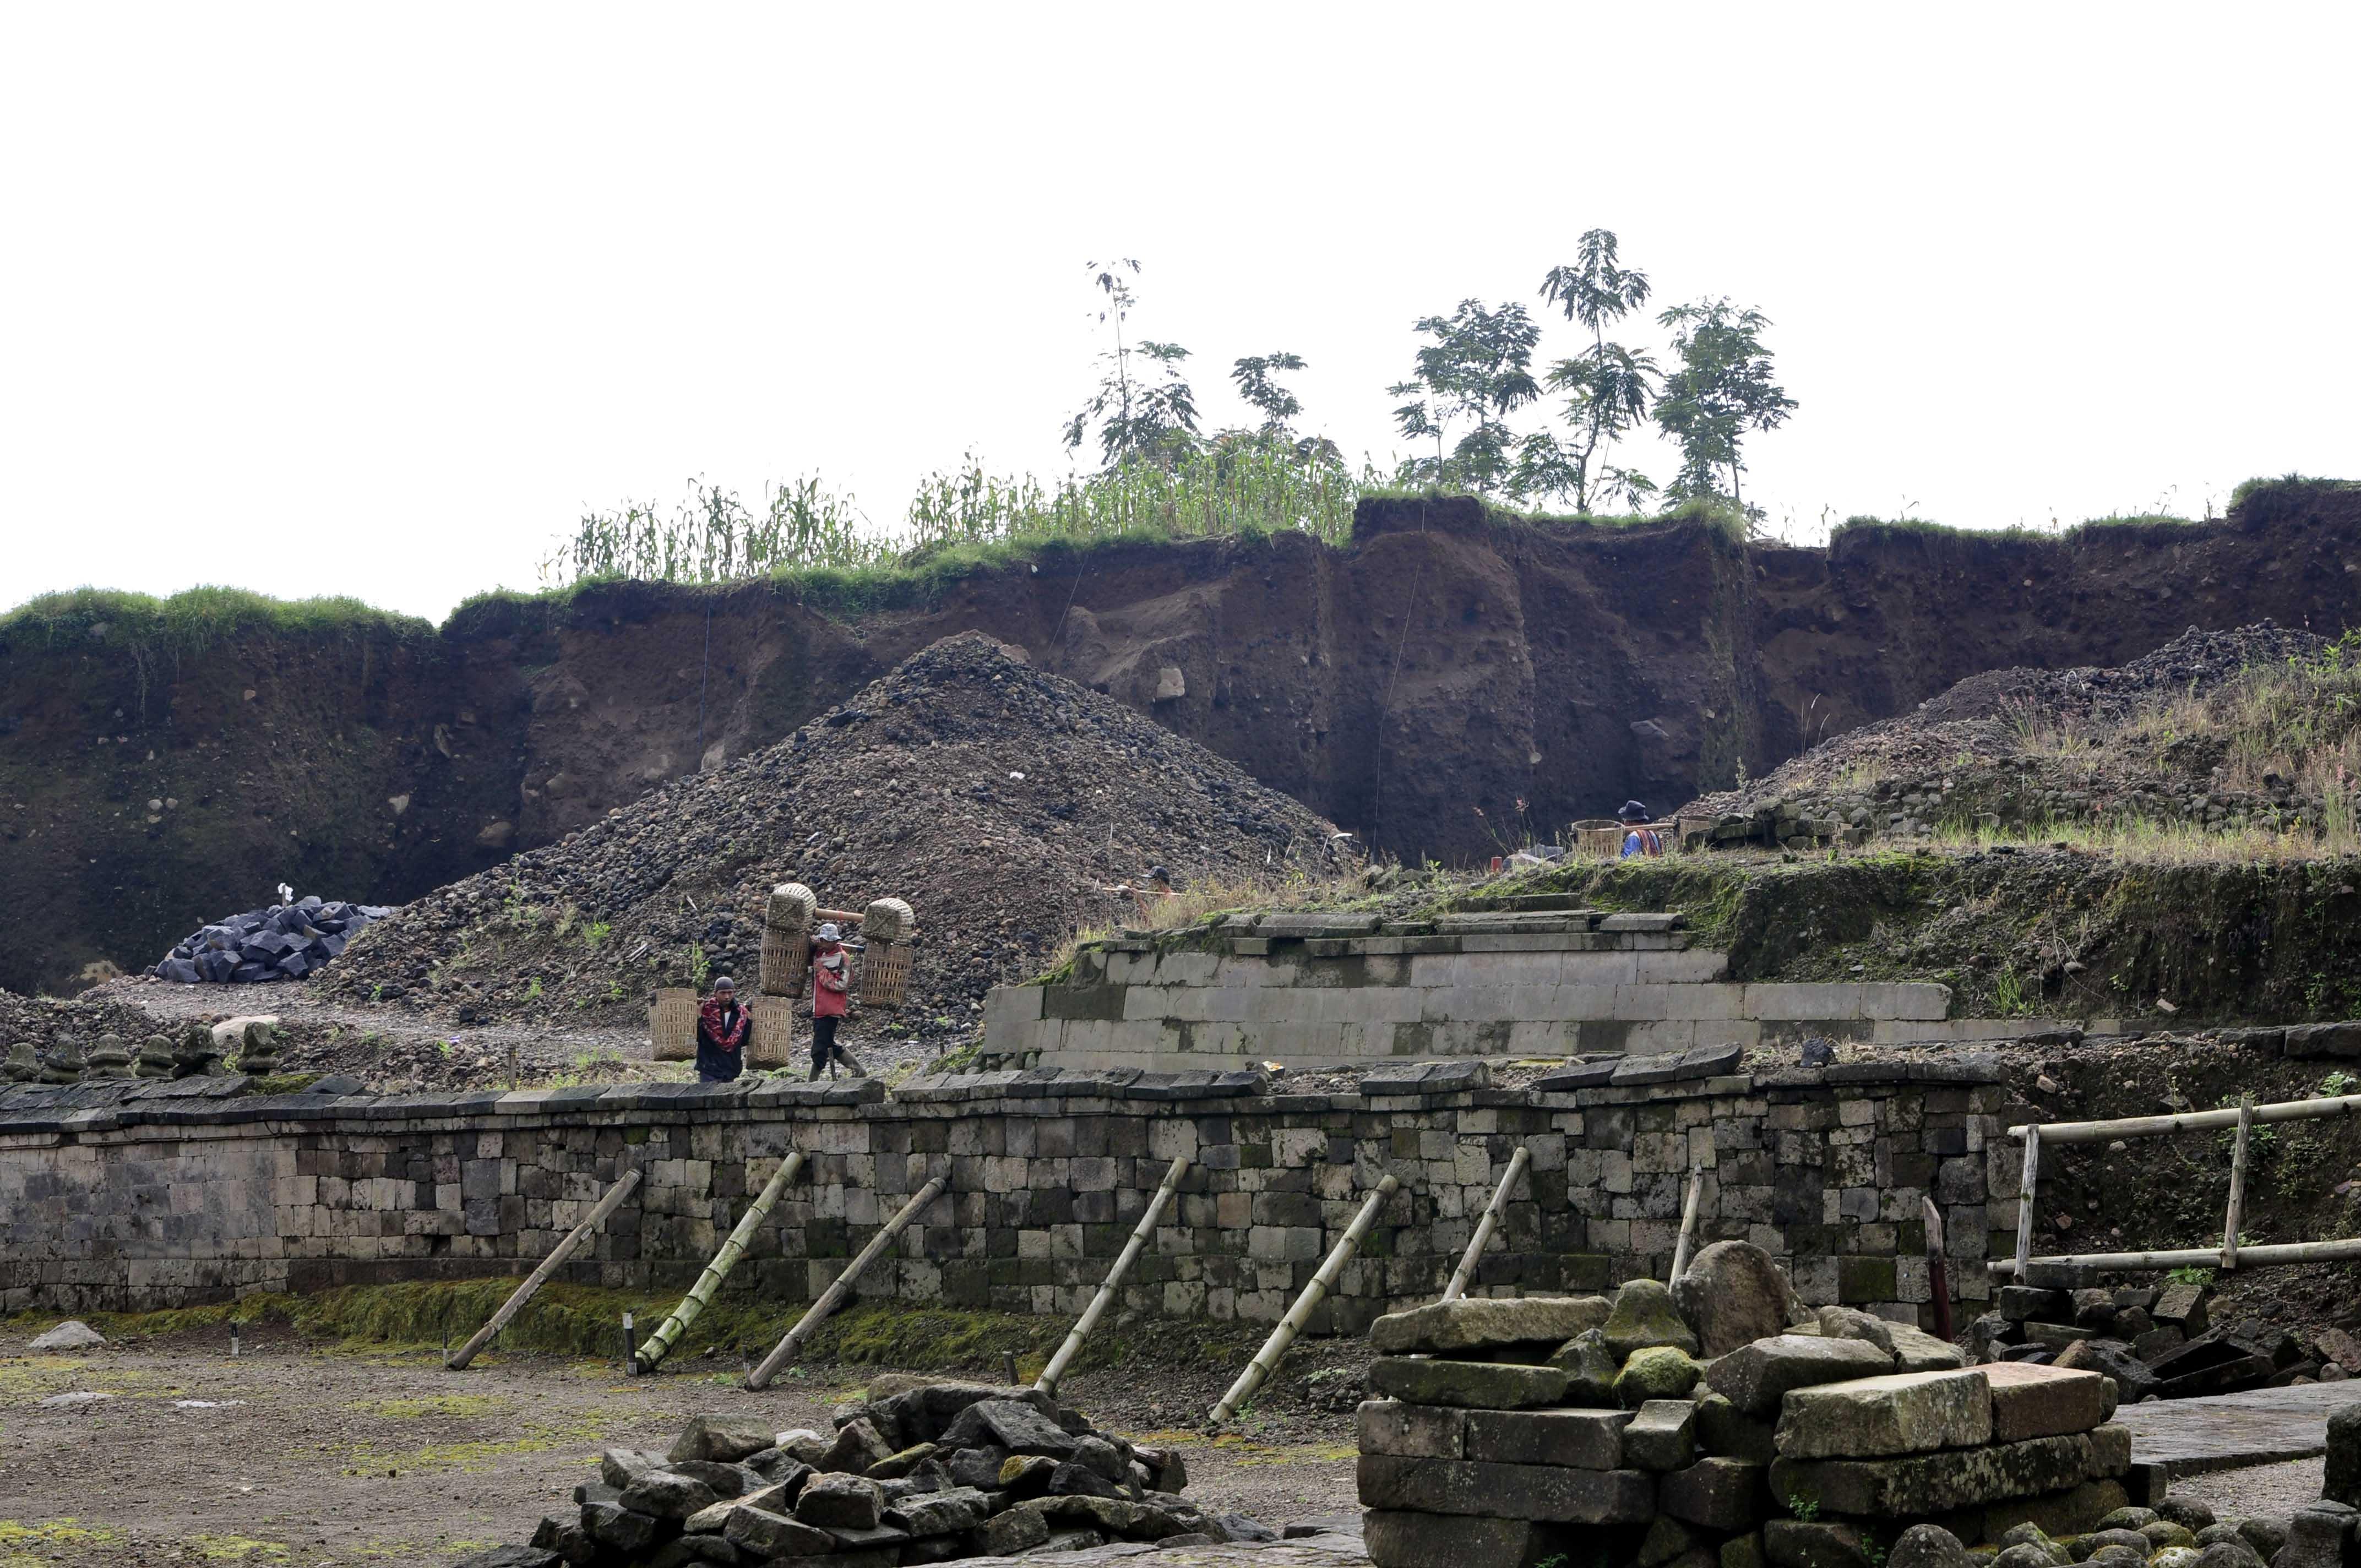 PAra penggali tambang tradisional yang masih menambang